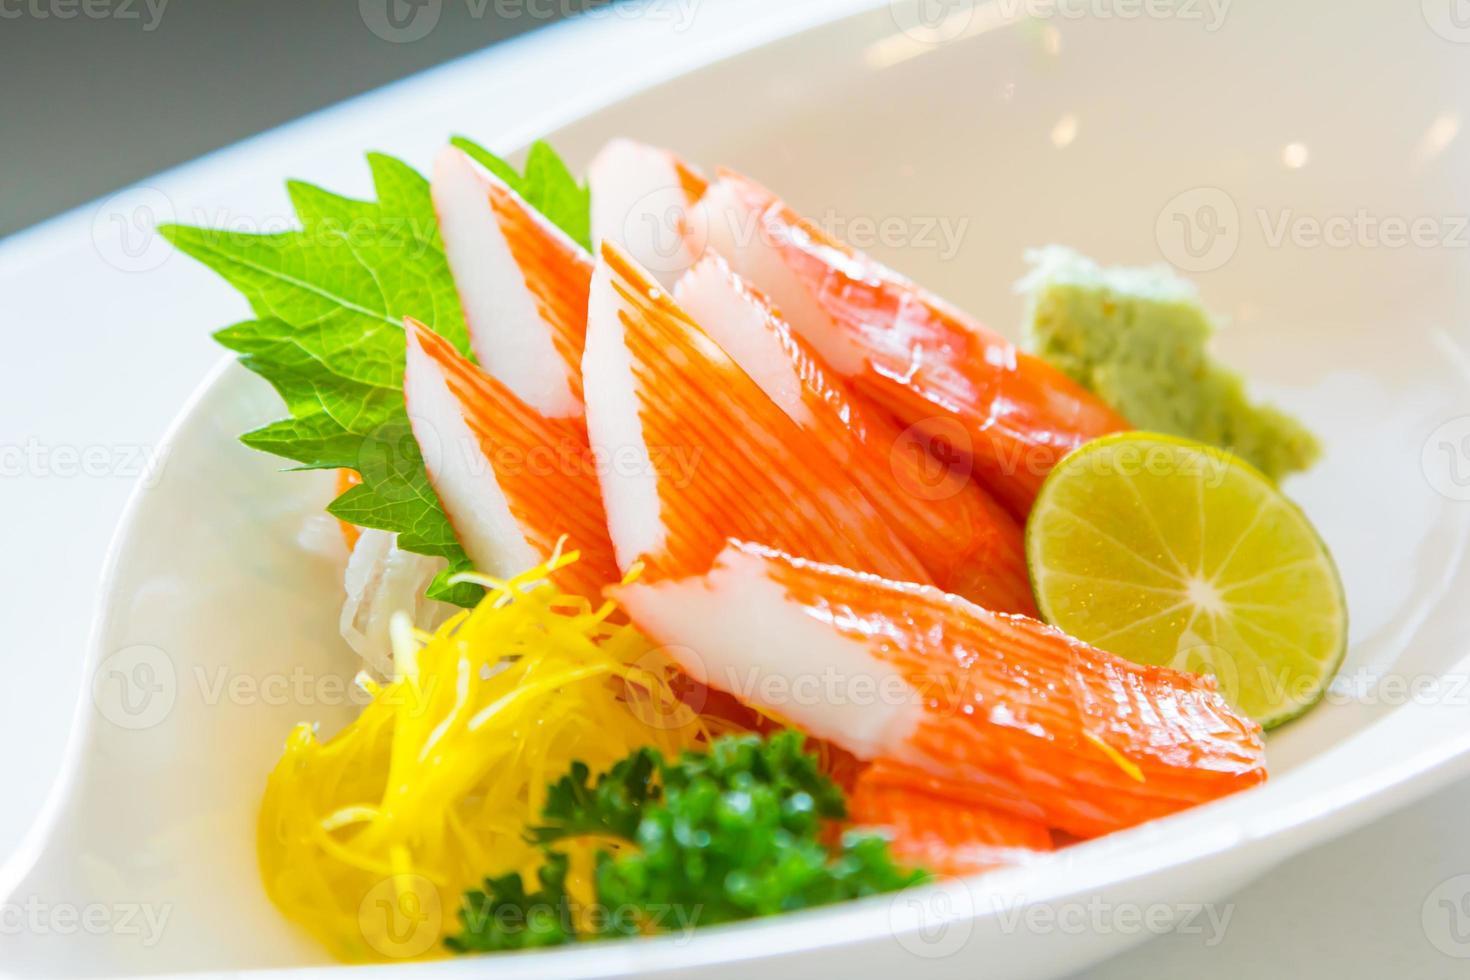 kani sashimi kani sashimi., imitación carne de cangrejo. foto